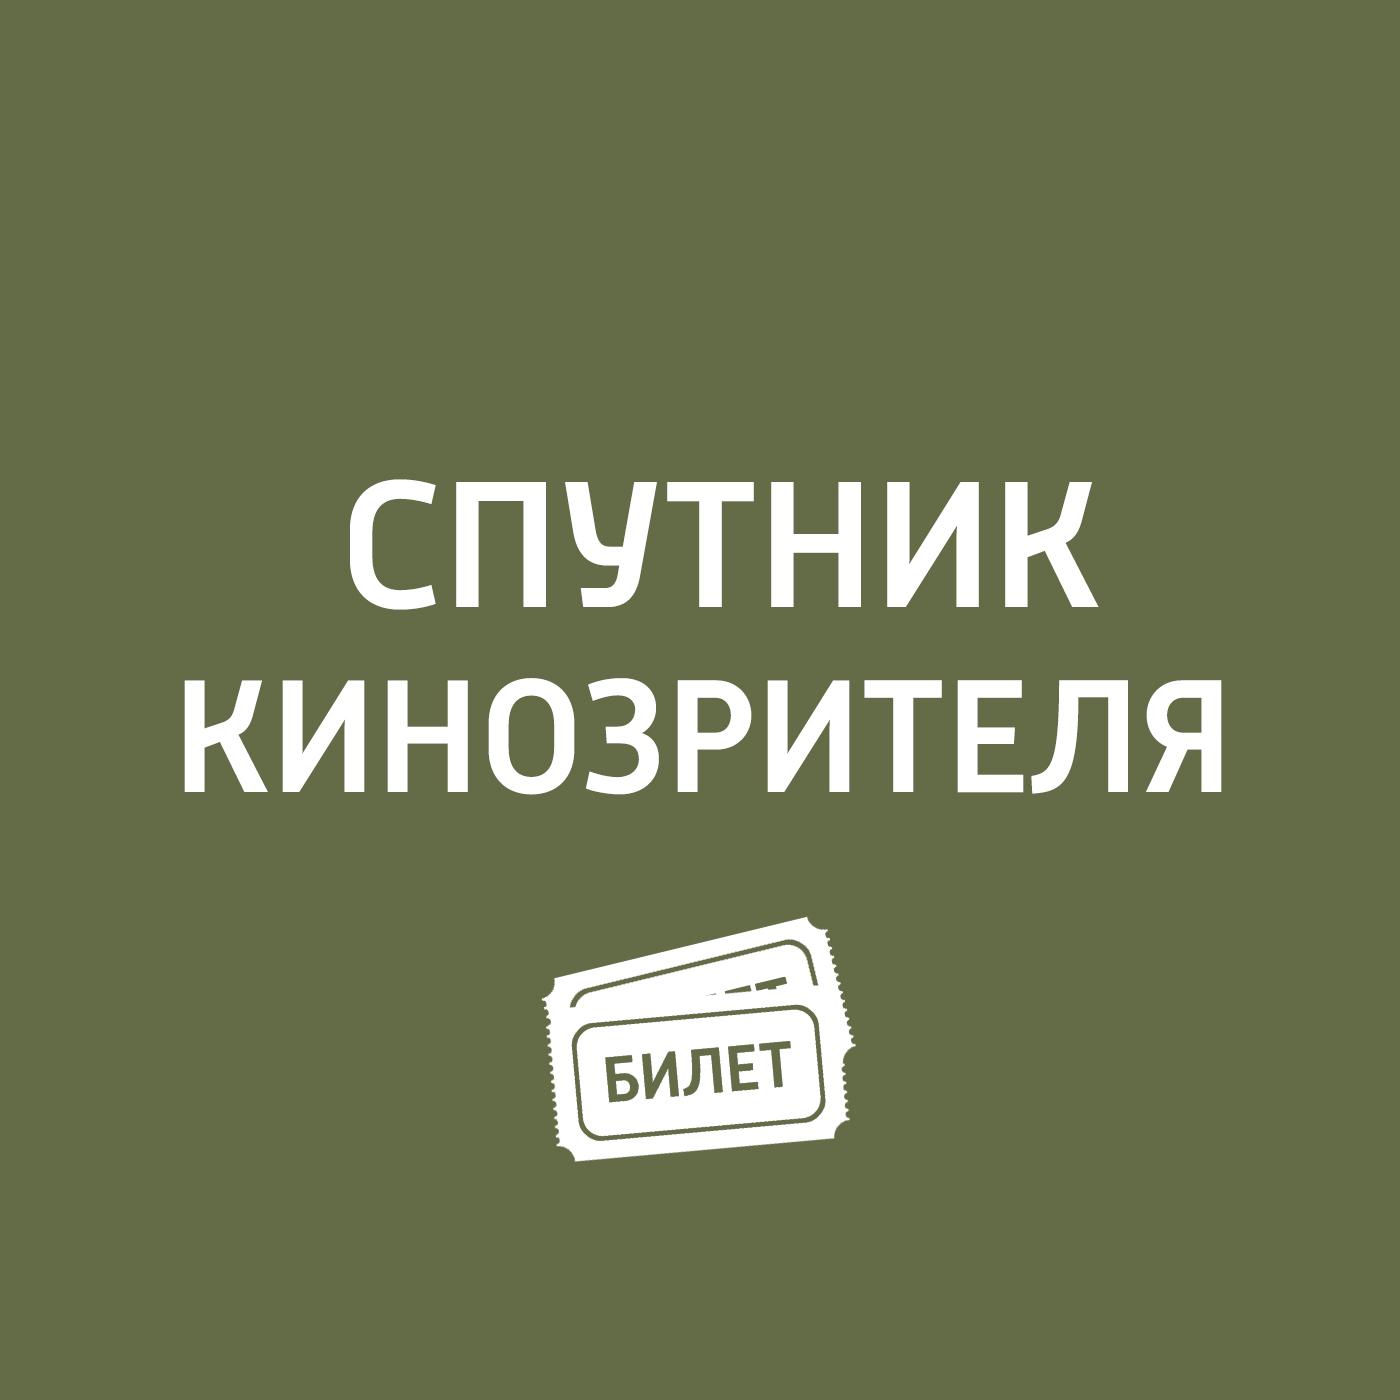 Антон Долин Война миров Z, «Пена дней цена